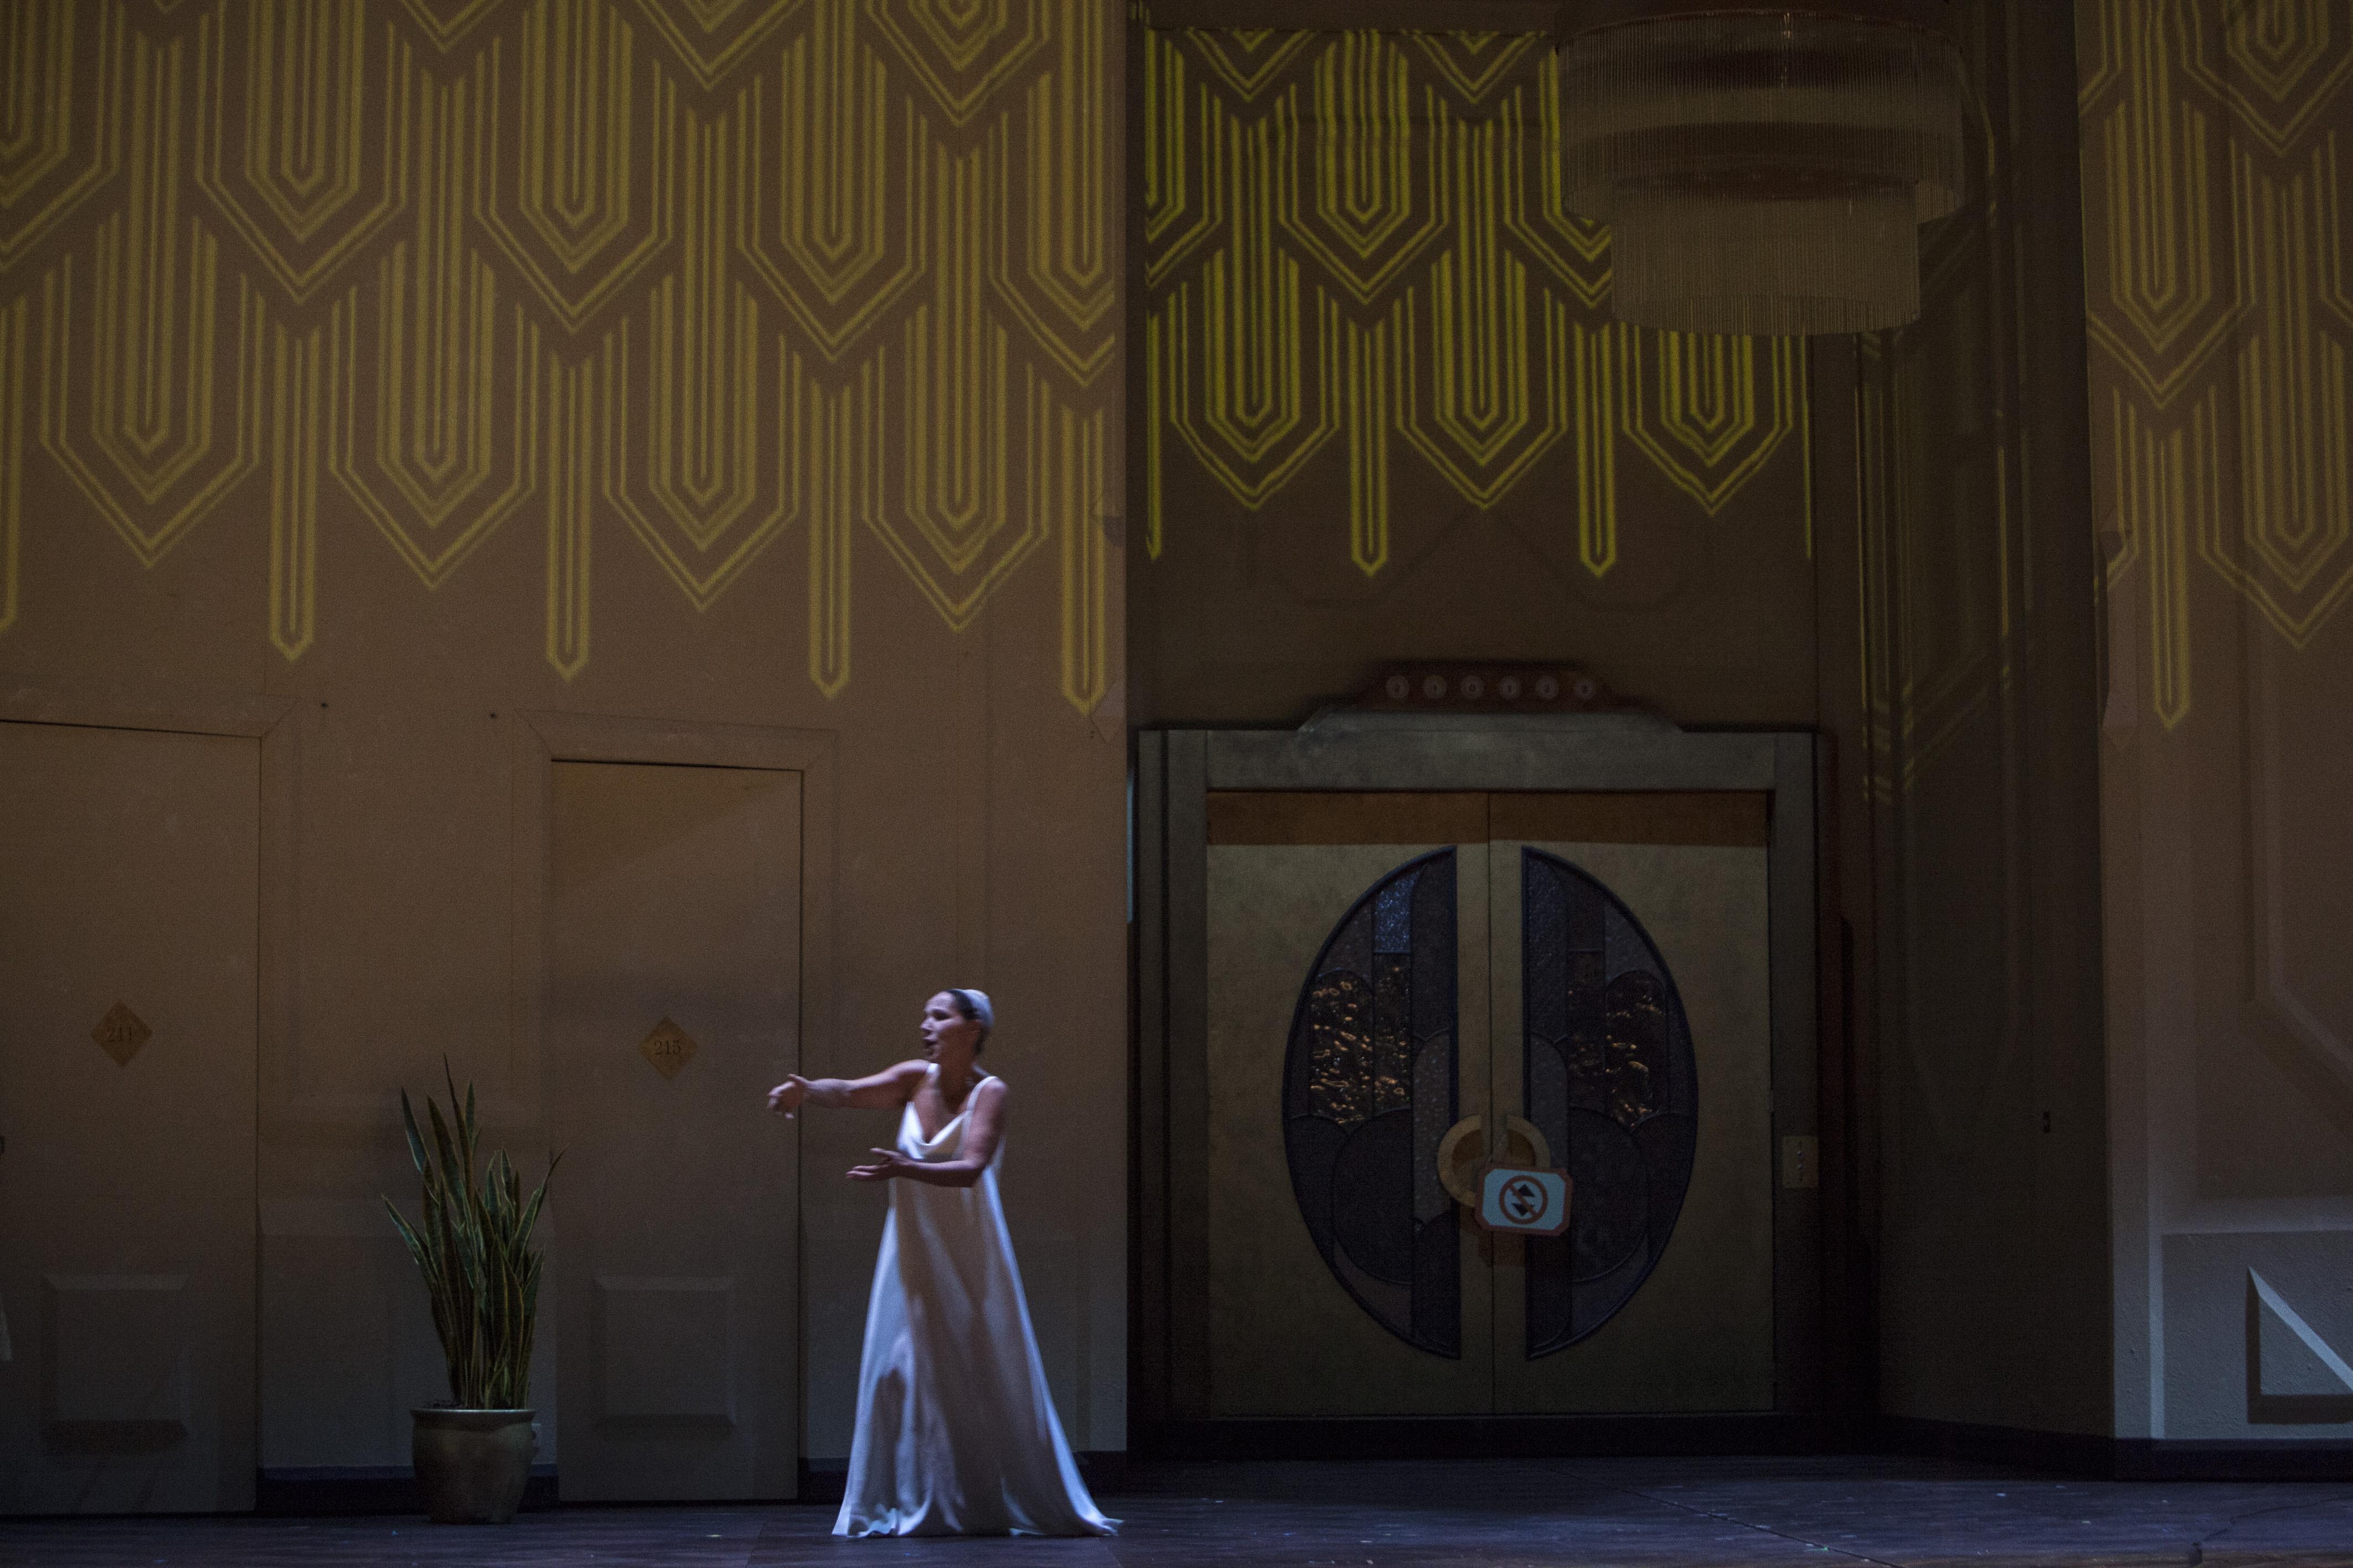 Macbeth de Verdi